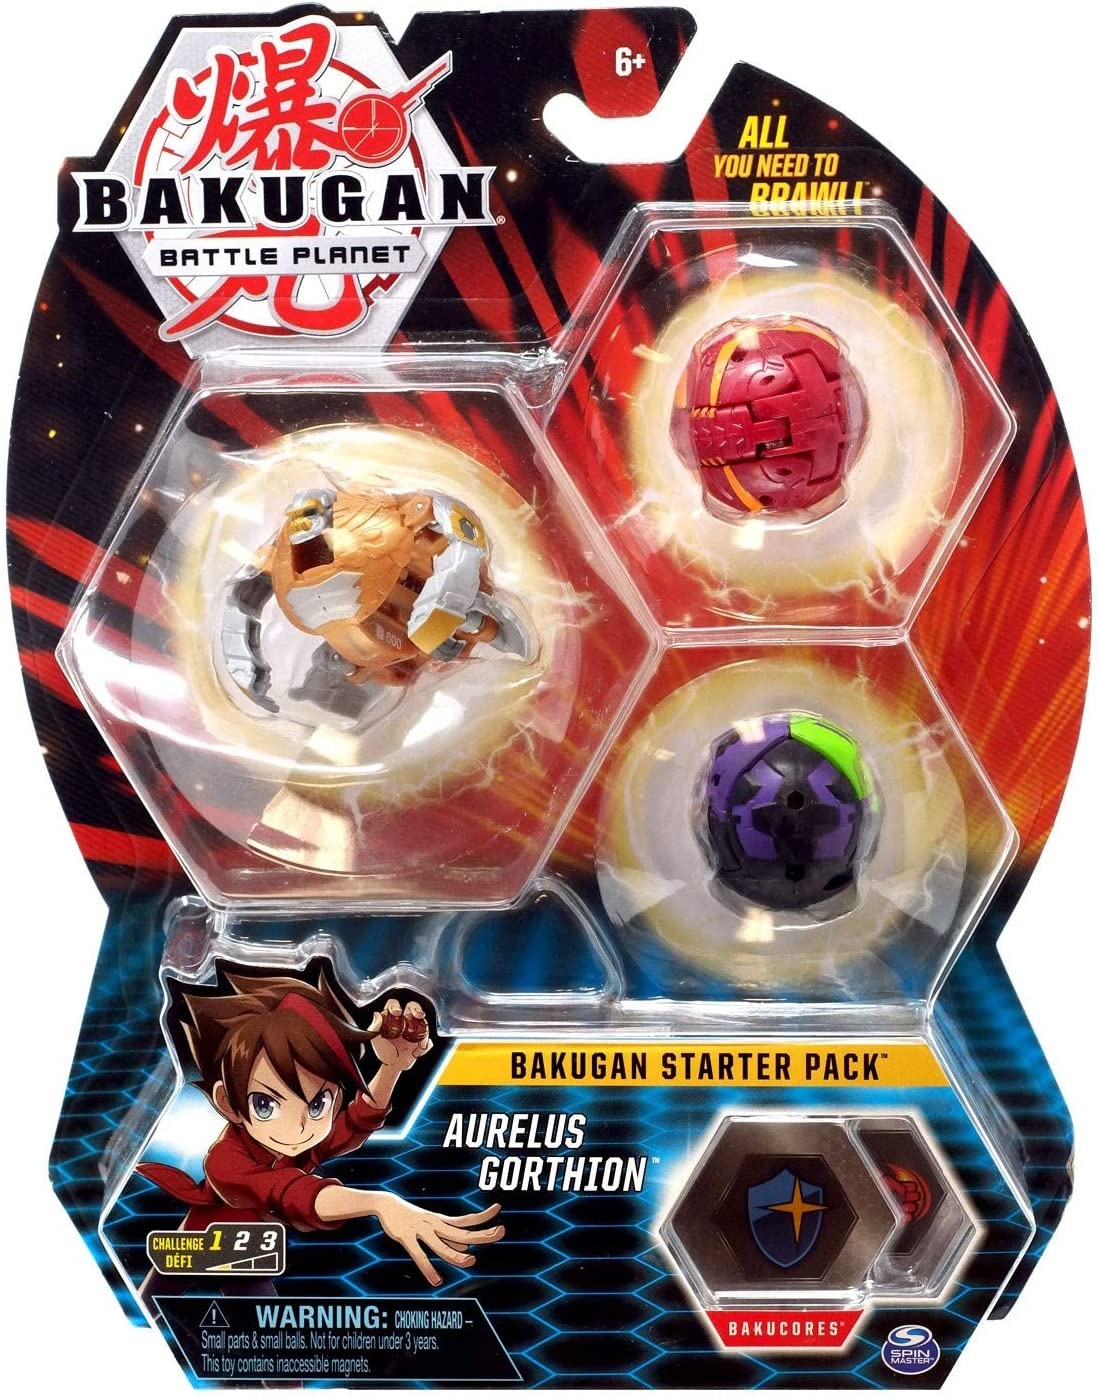 BKGAN Bakugan Starter Pack Aurelus Gorthion: Amazon.es: Juguetes y ...